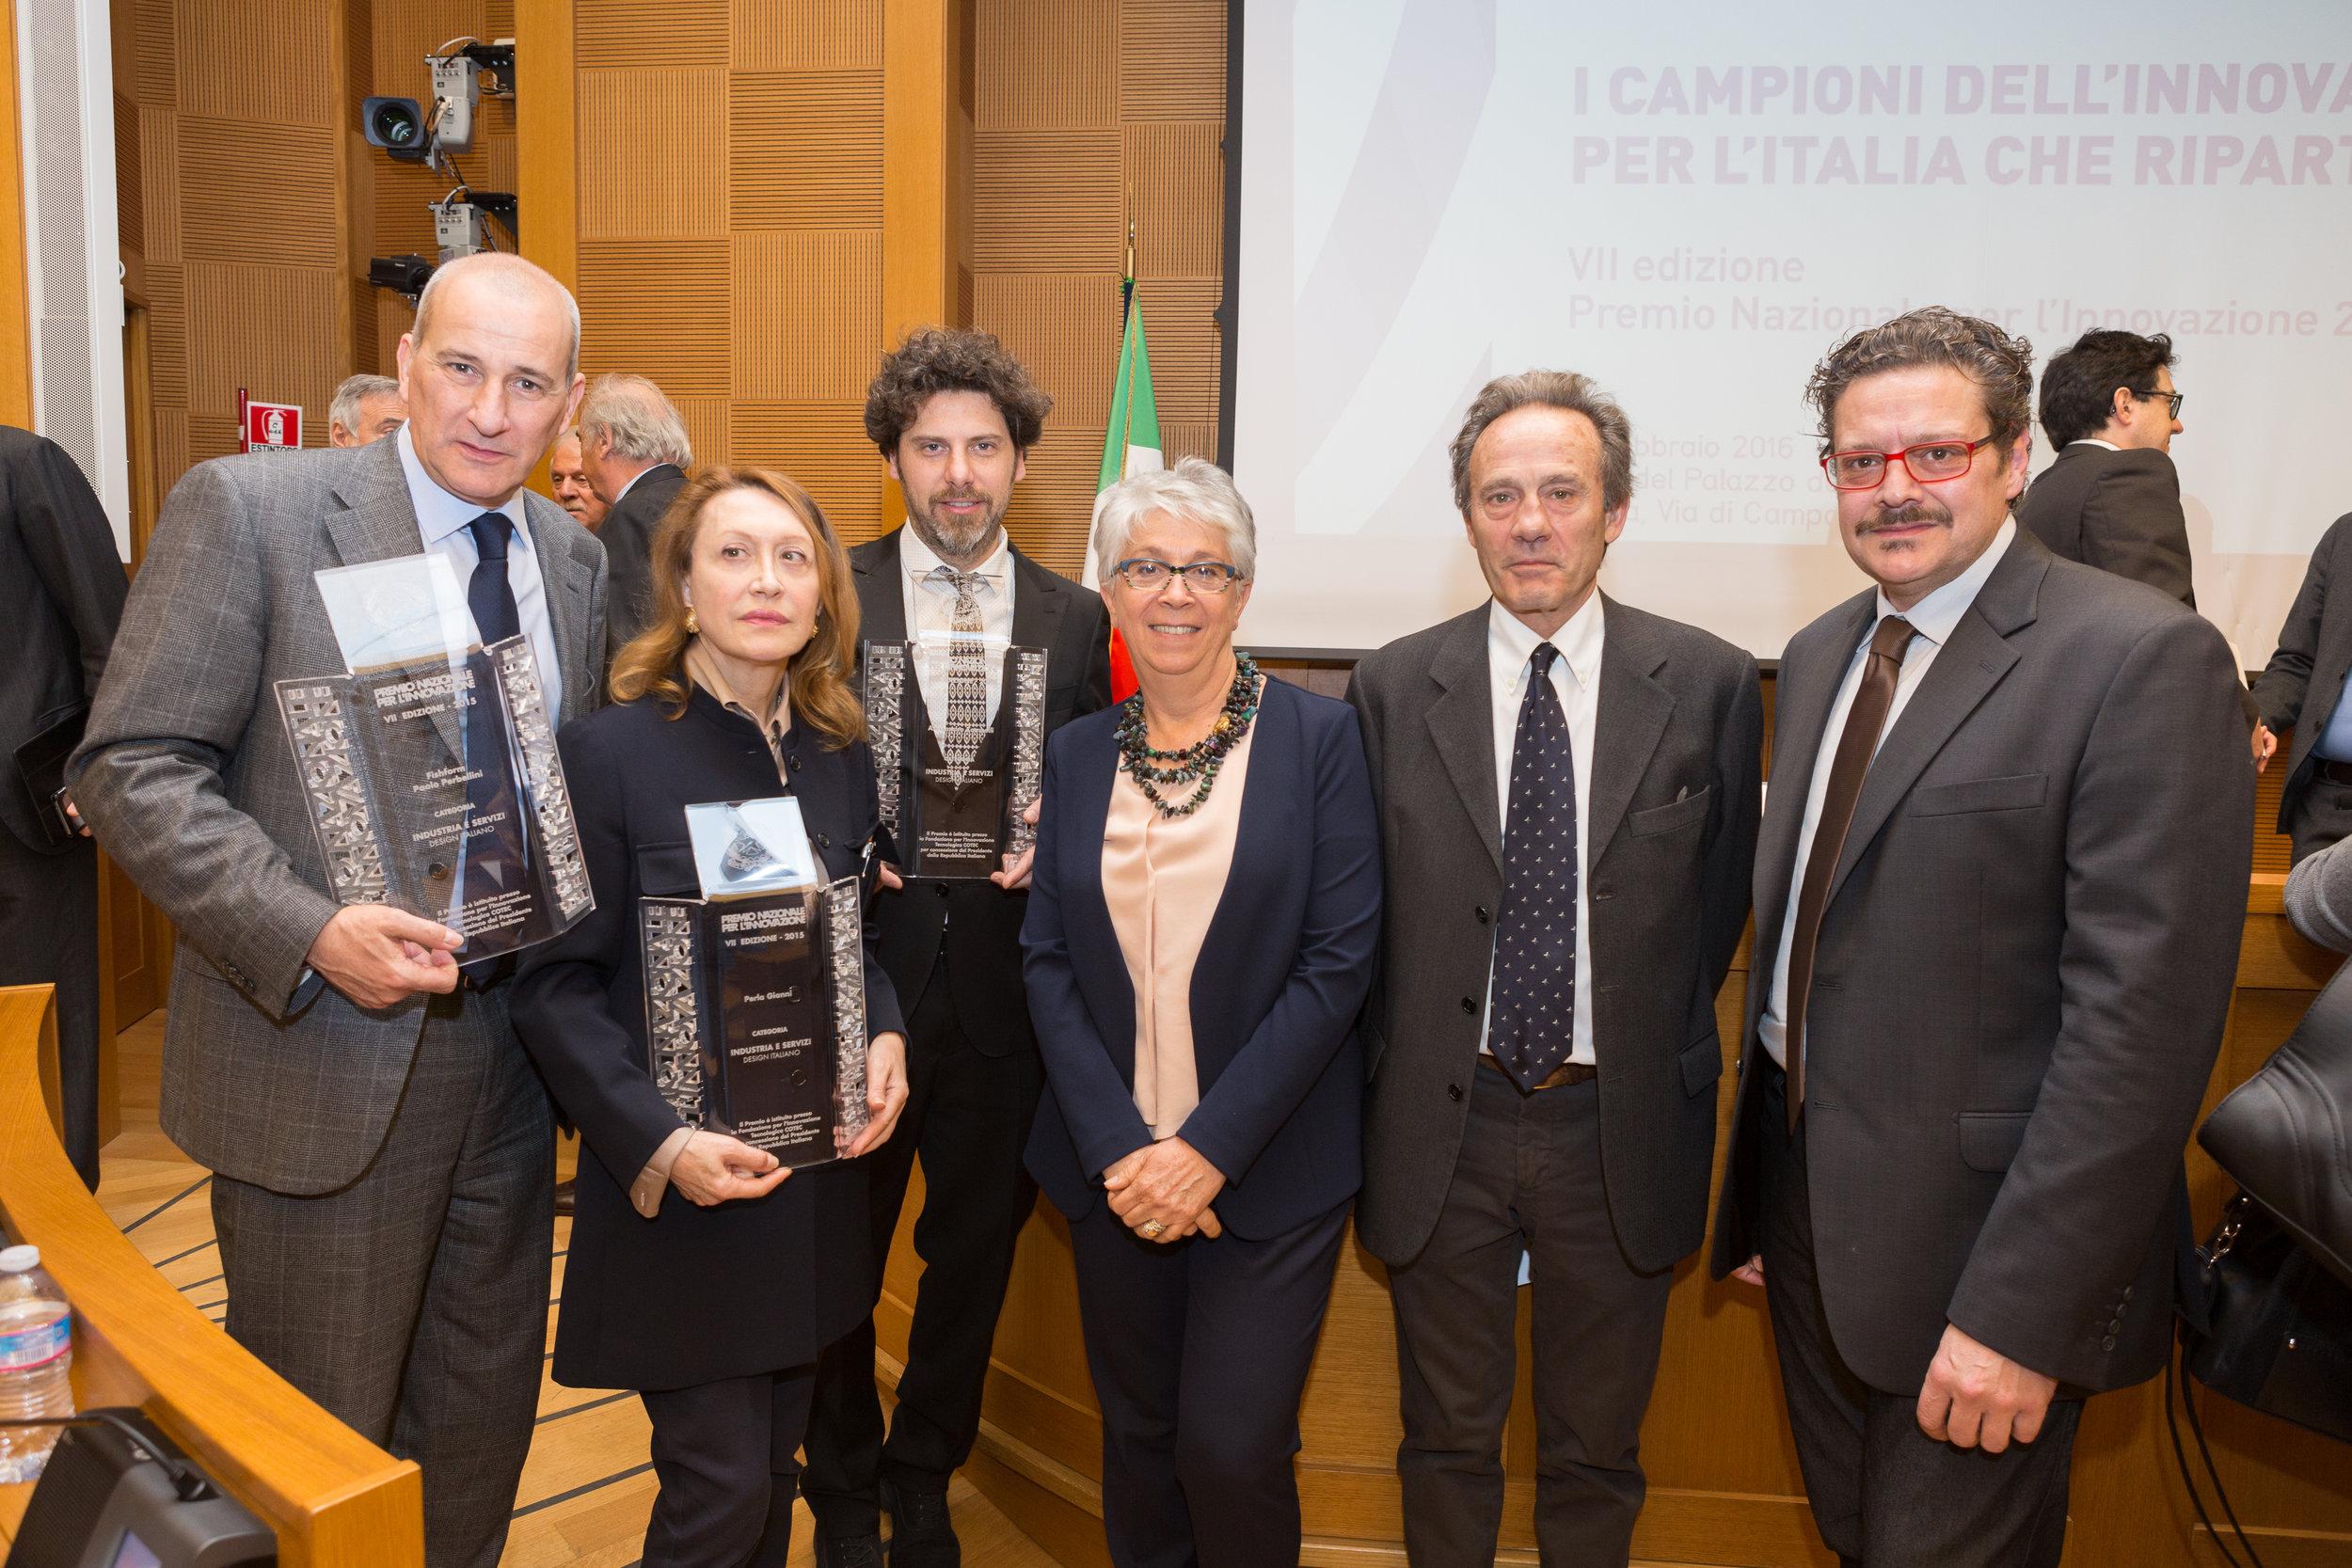 P. Gianni Premio dei Premi.jpg